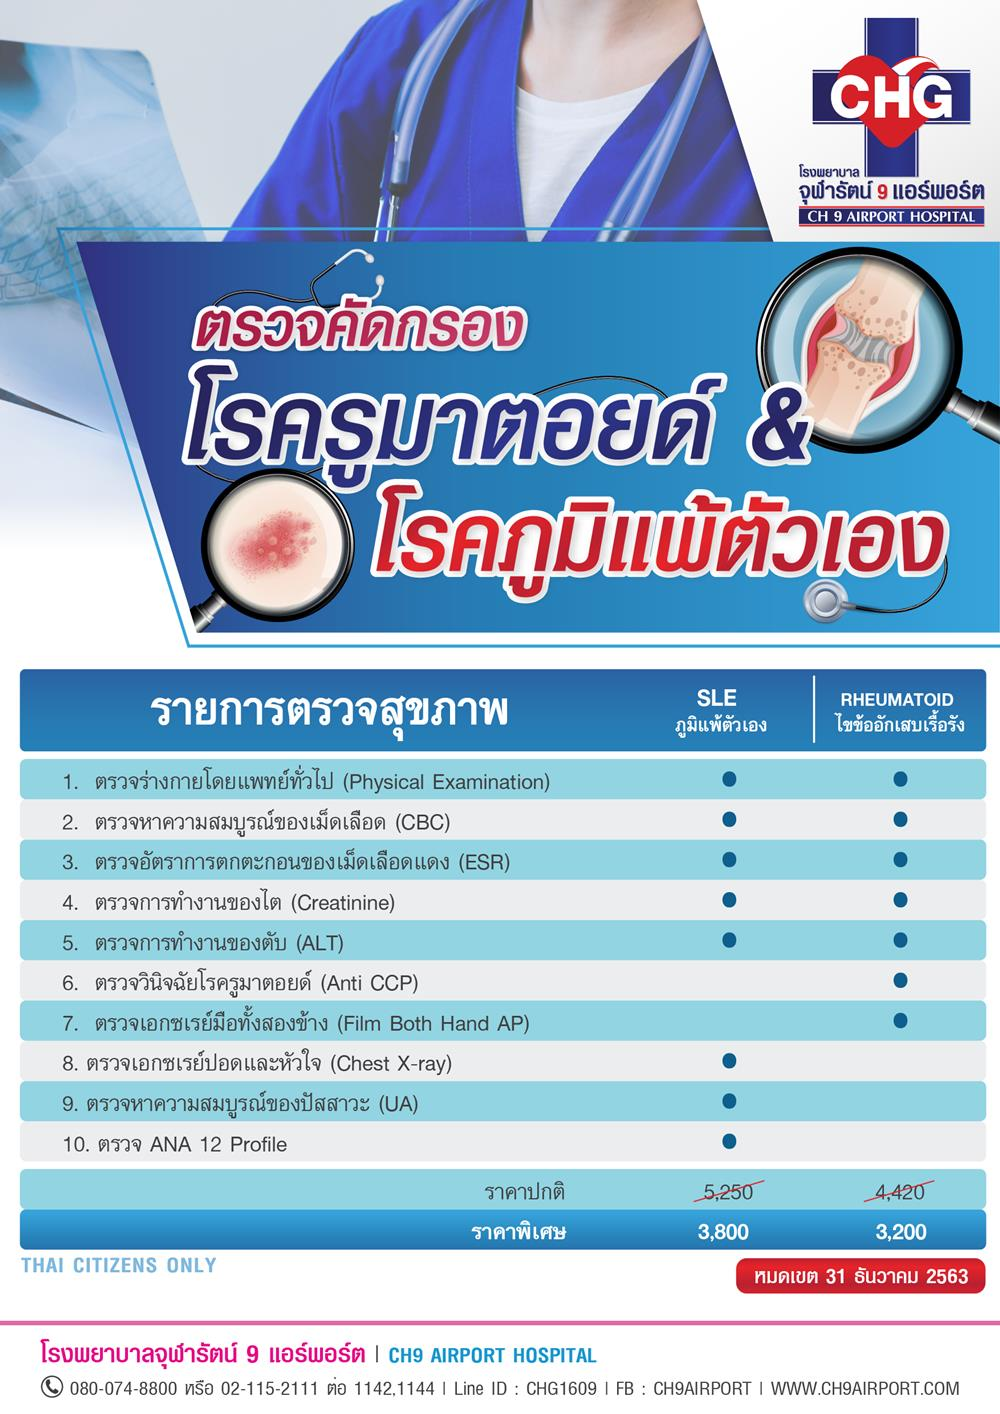 6301-pro-sle-rheumatoid-1